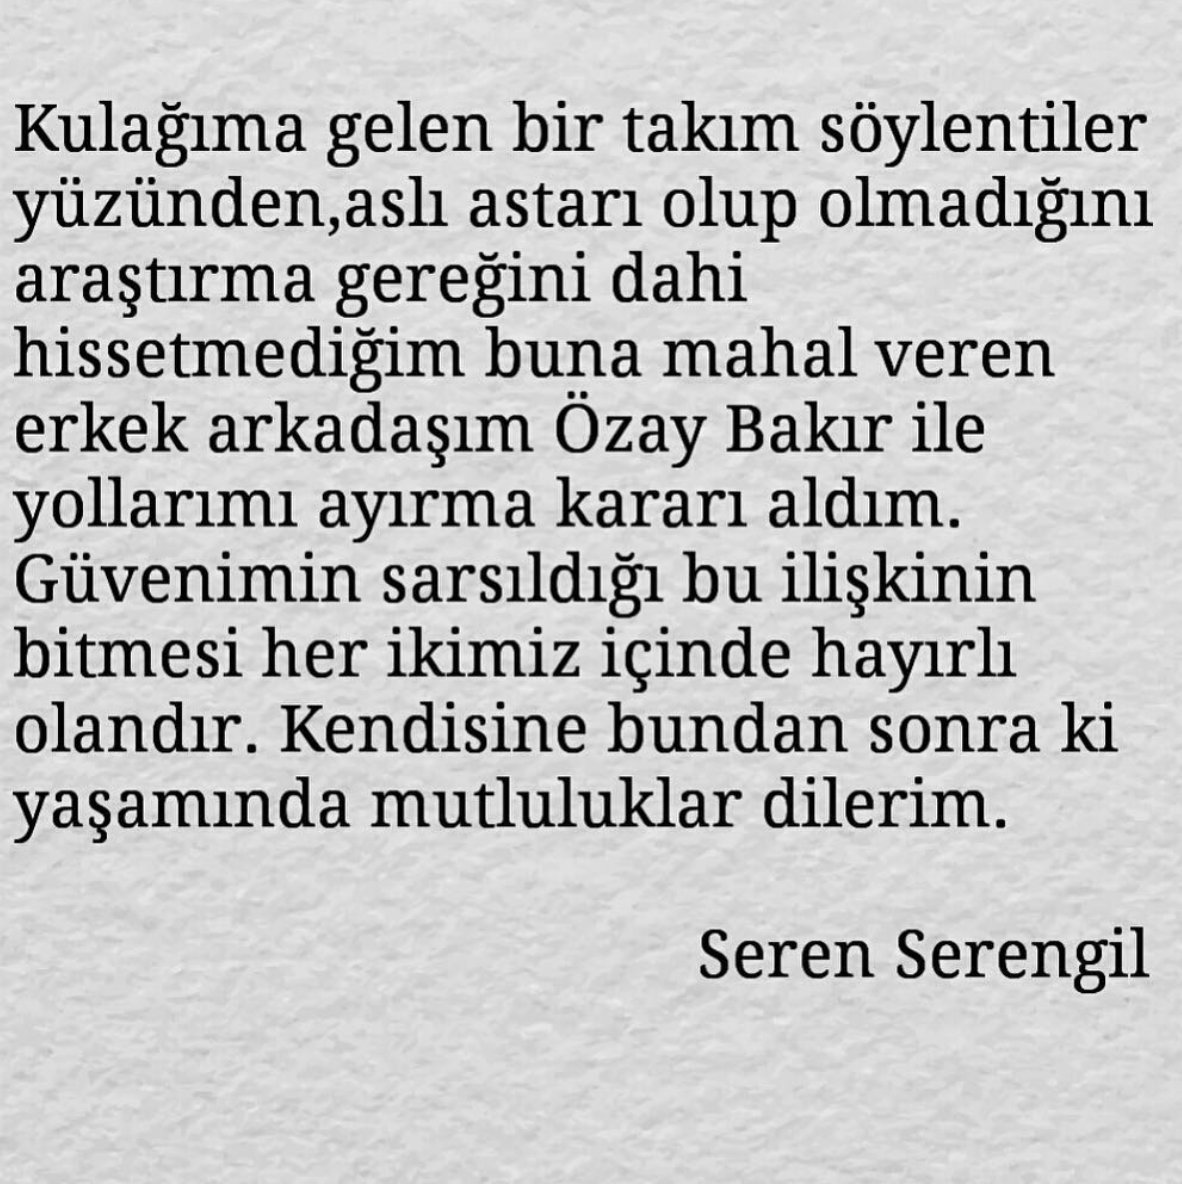 Seren Serengil sevgilisini terk etti